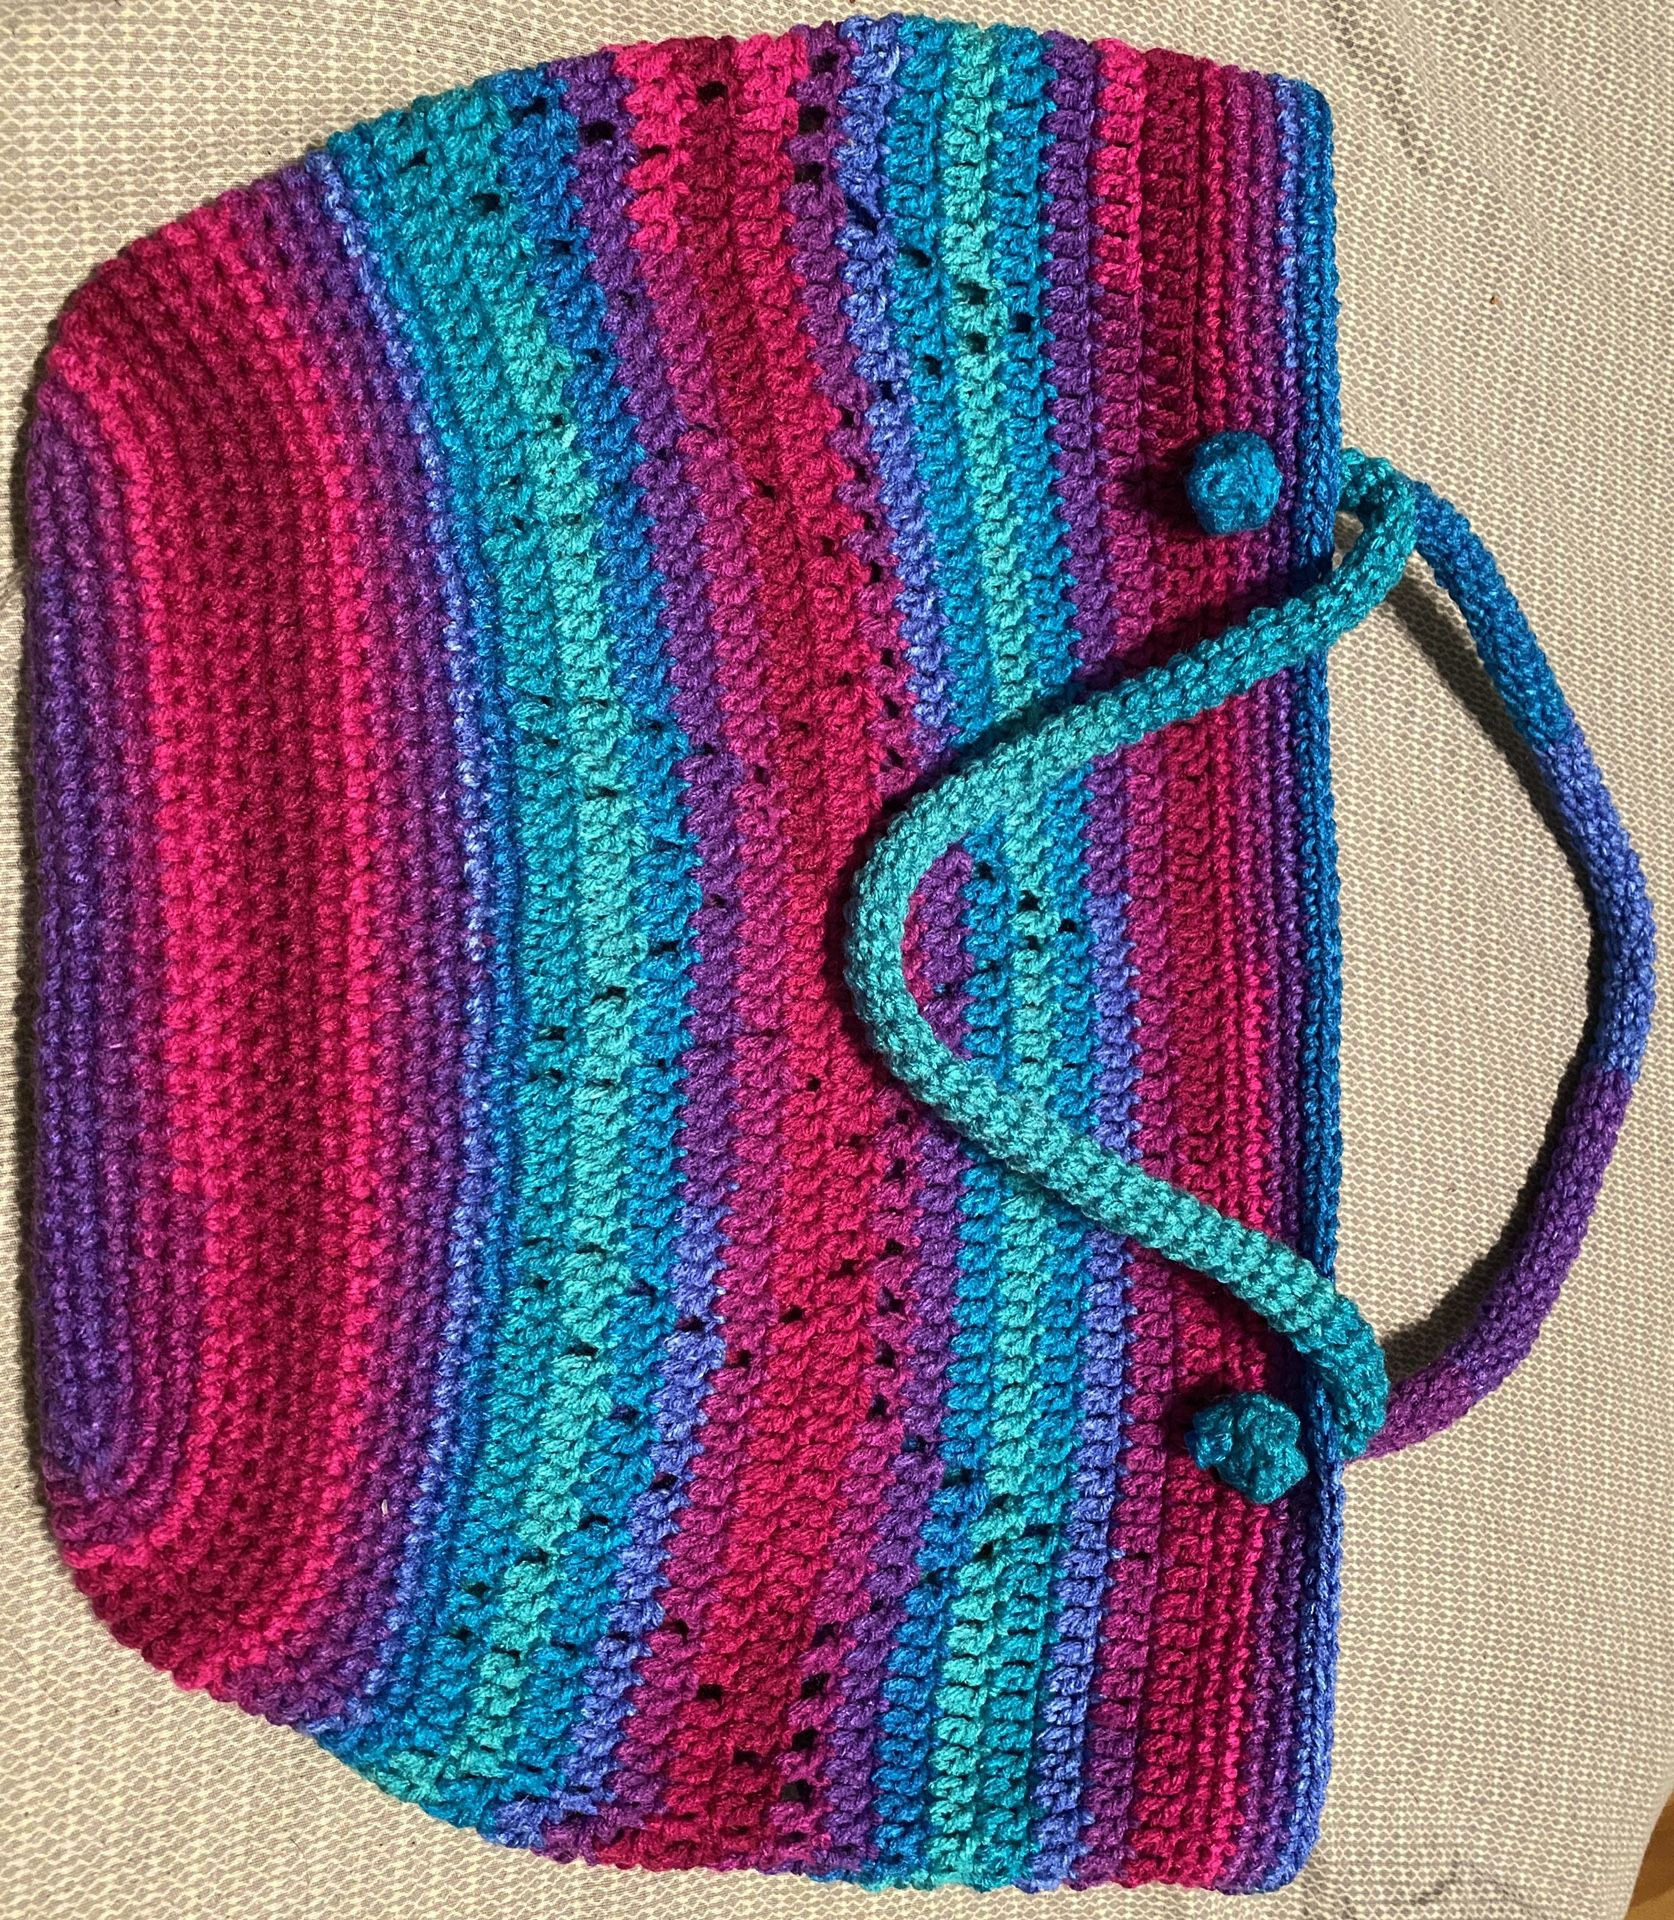 Crochet star market/tote bag